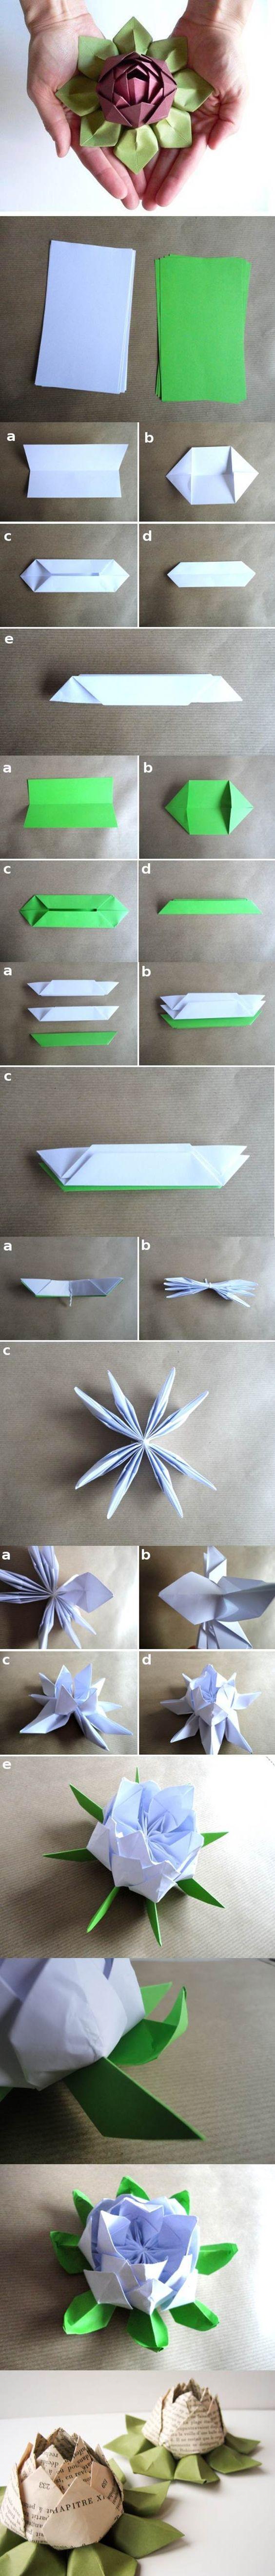 Diy origami lotus flower diy origami lotus flower and lotus diy origami lotus flower izmirmasajfo